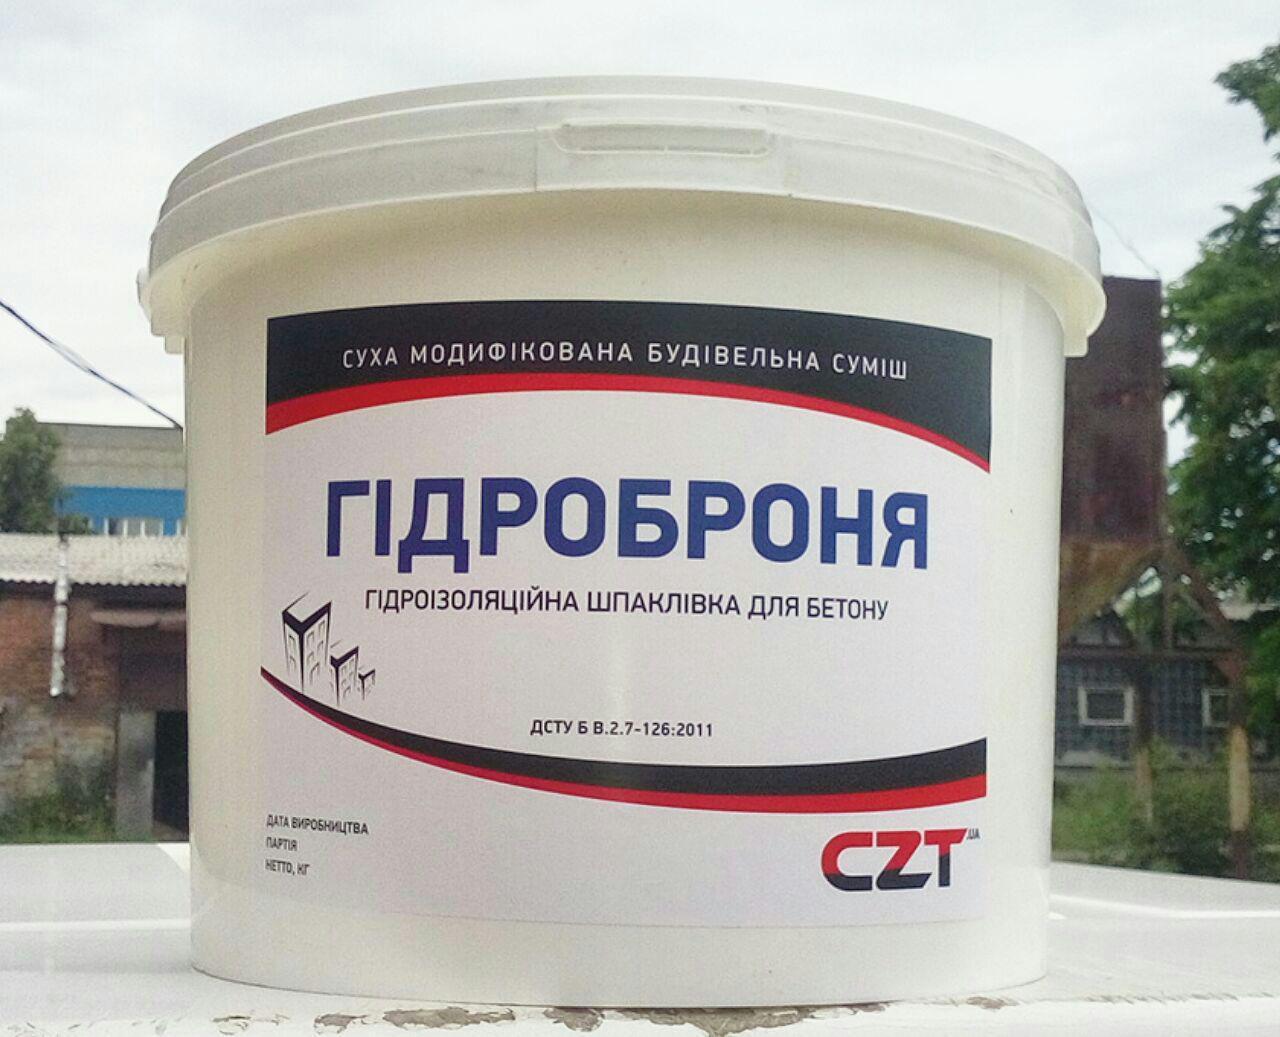 ГИДРОБРОНЯ (Серый, 5кг) Гидроизоляция для бетона